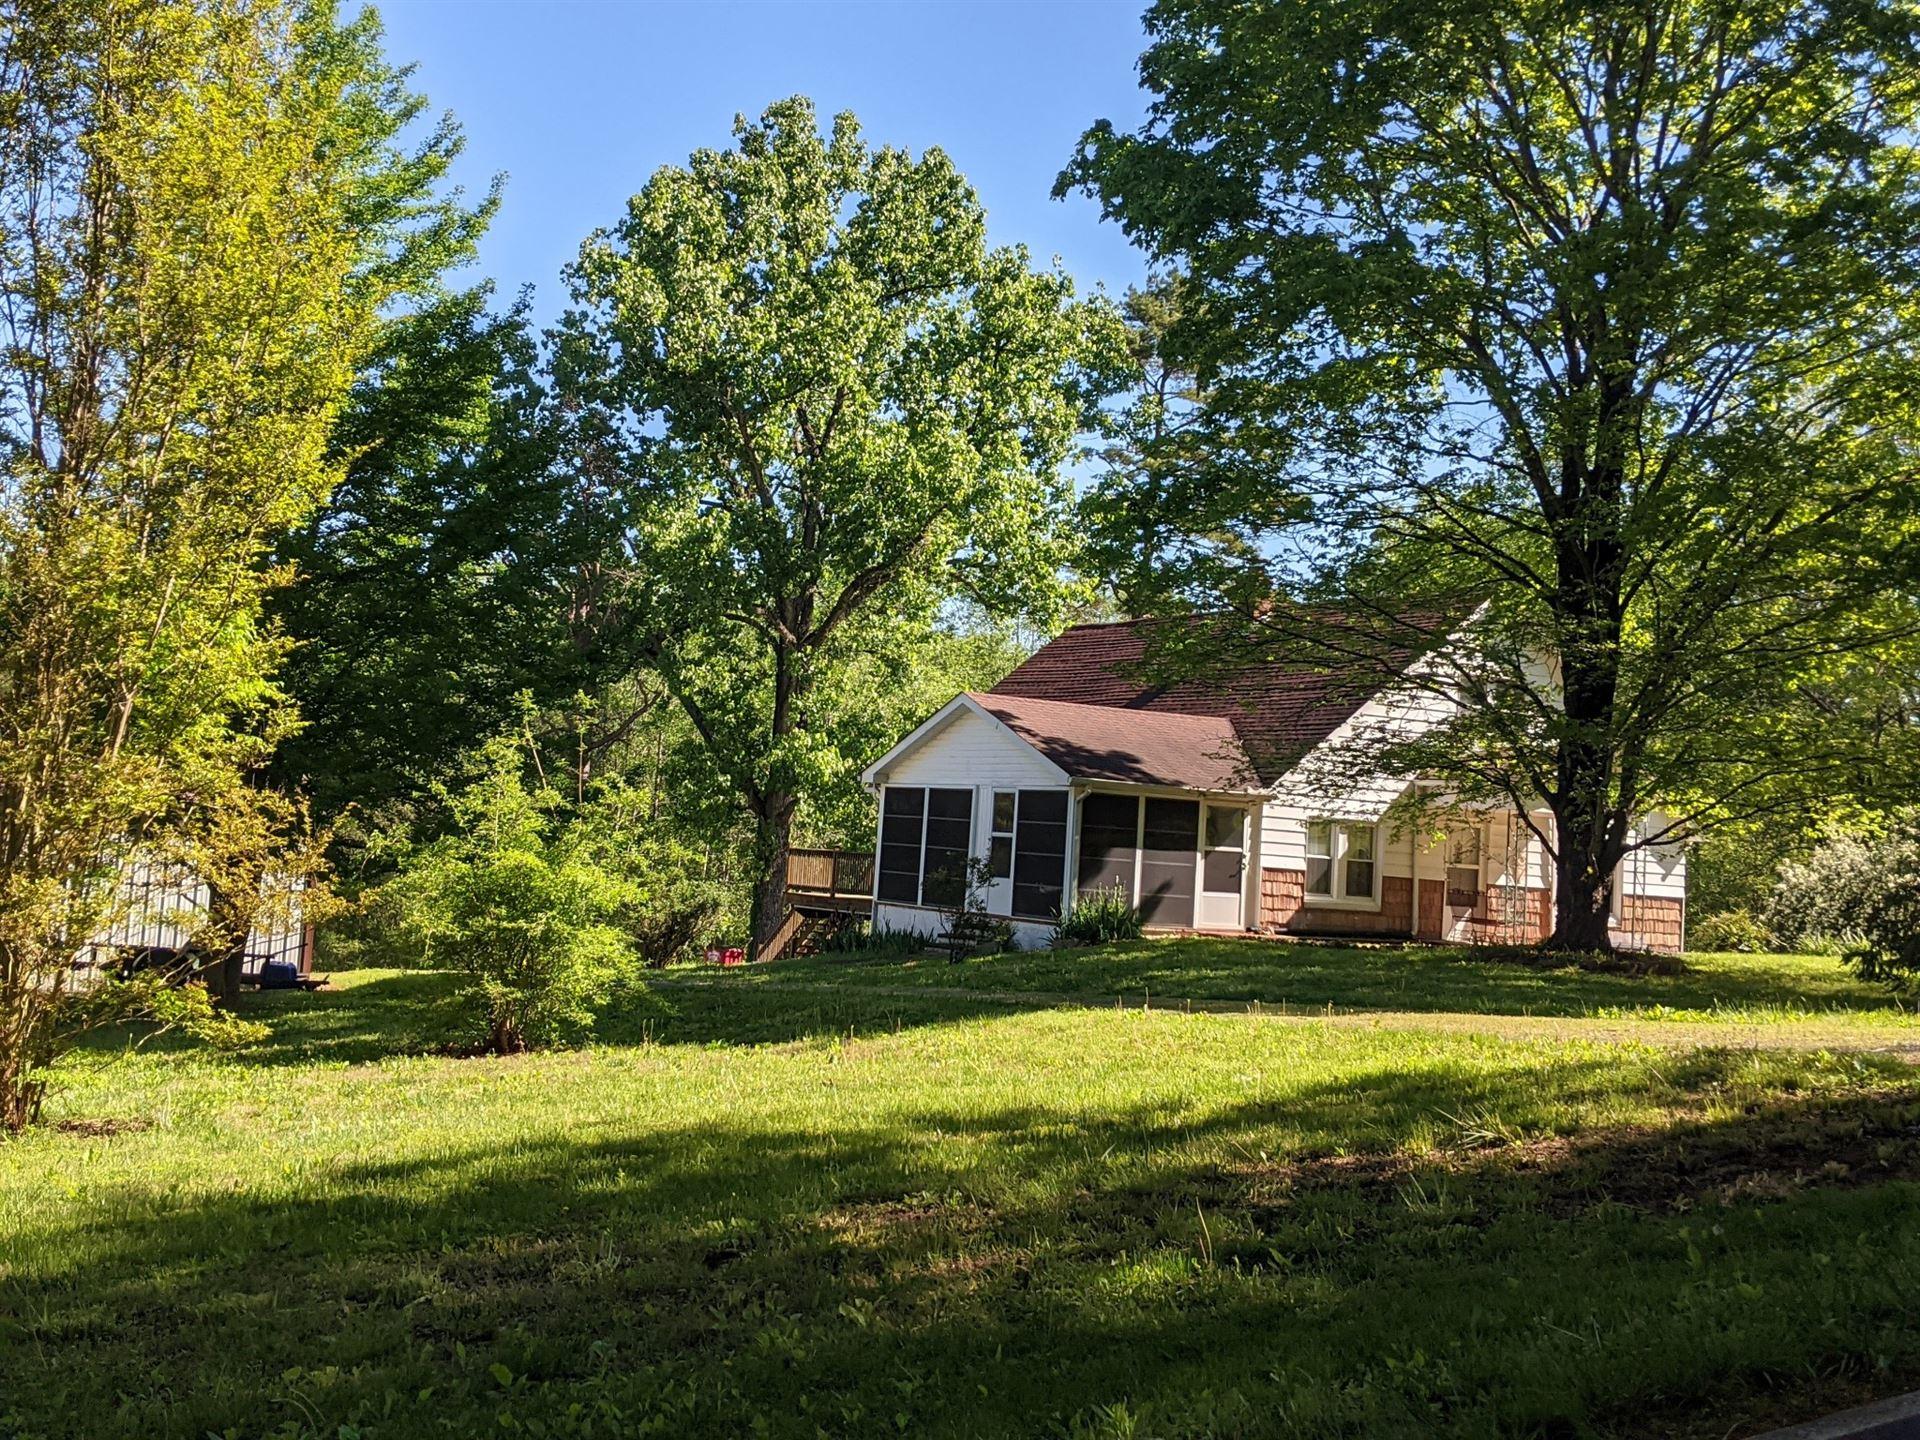 1199 Salem Rd, Clarksville, TN 37040 - MLS#: 2261098